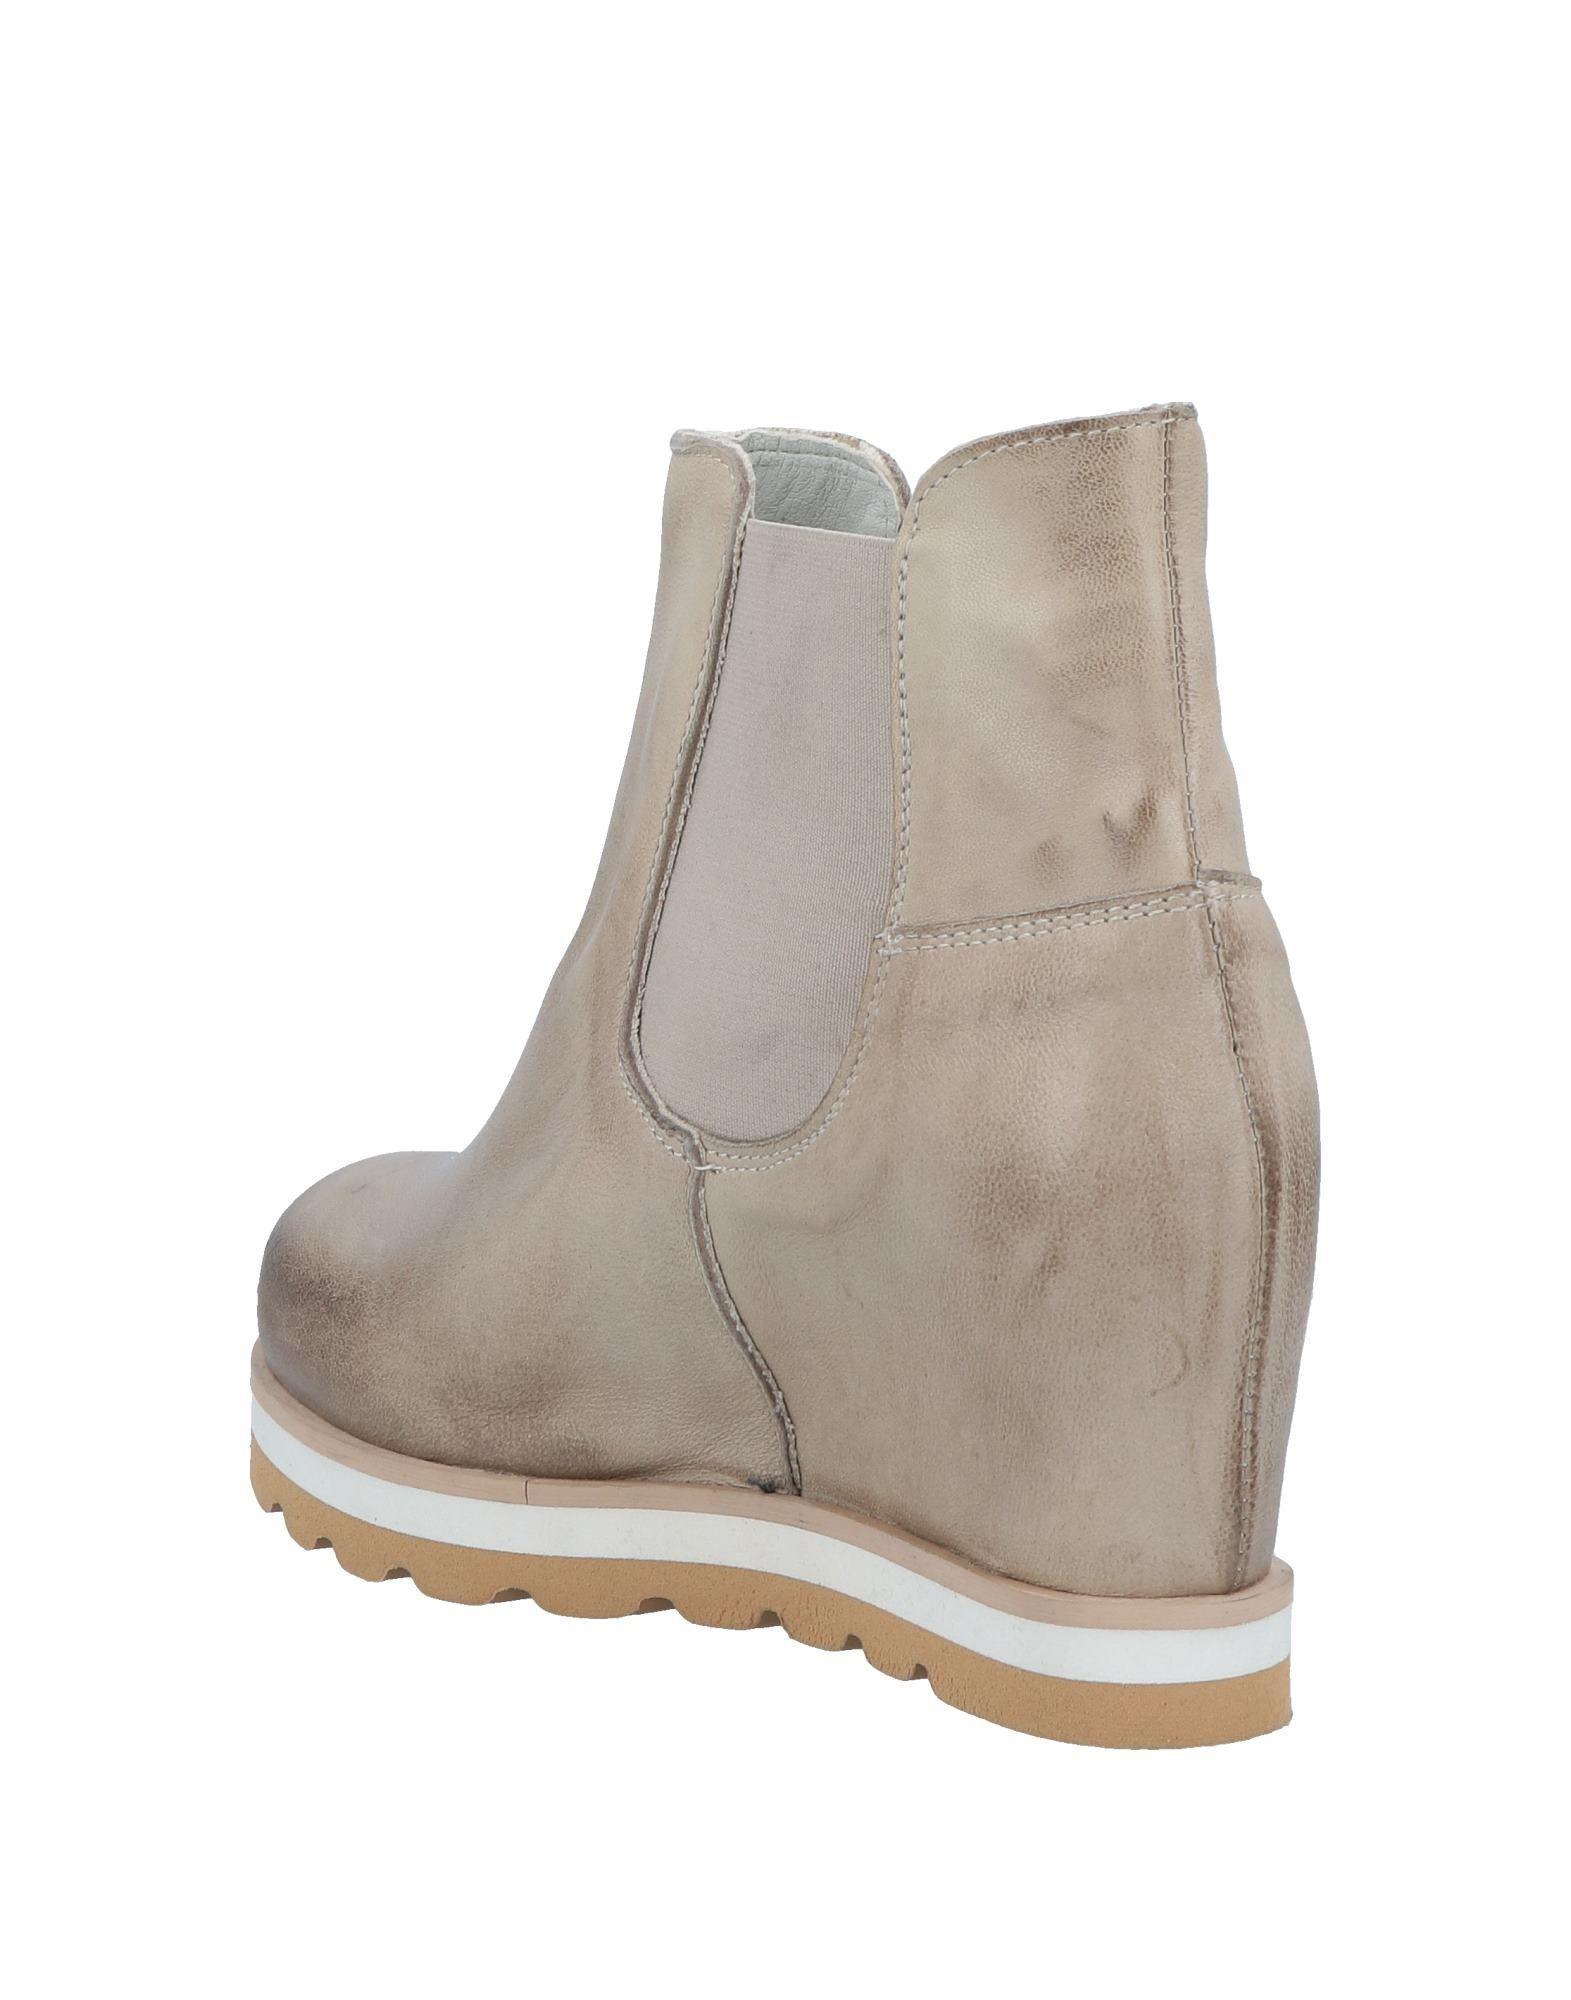 faad517bcf84 Lyst - Elsa Marotta Ankle Boots in Natural